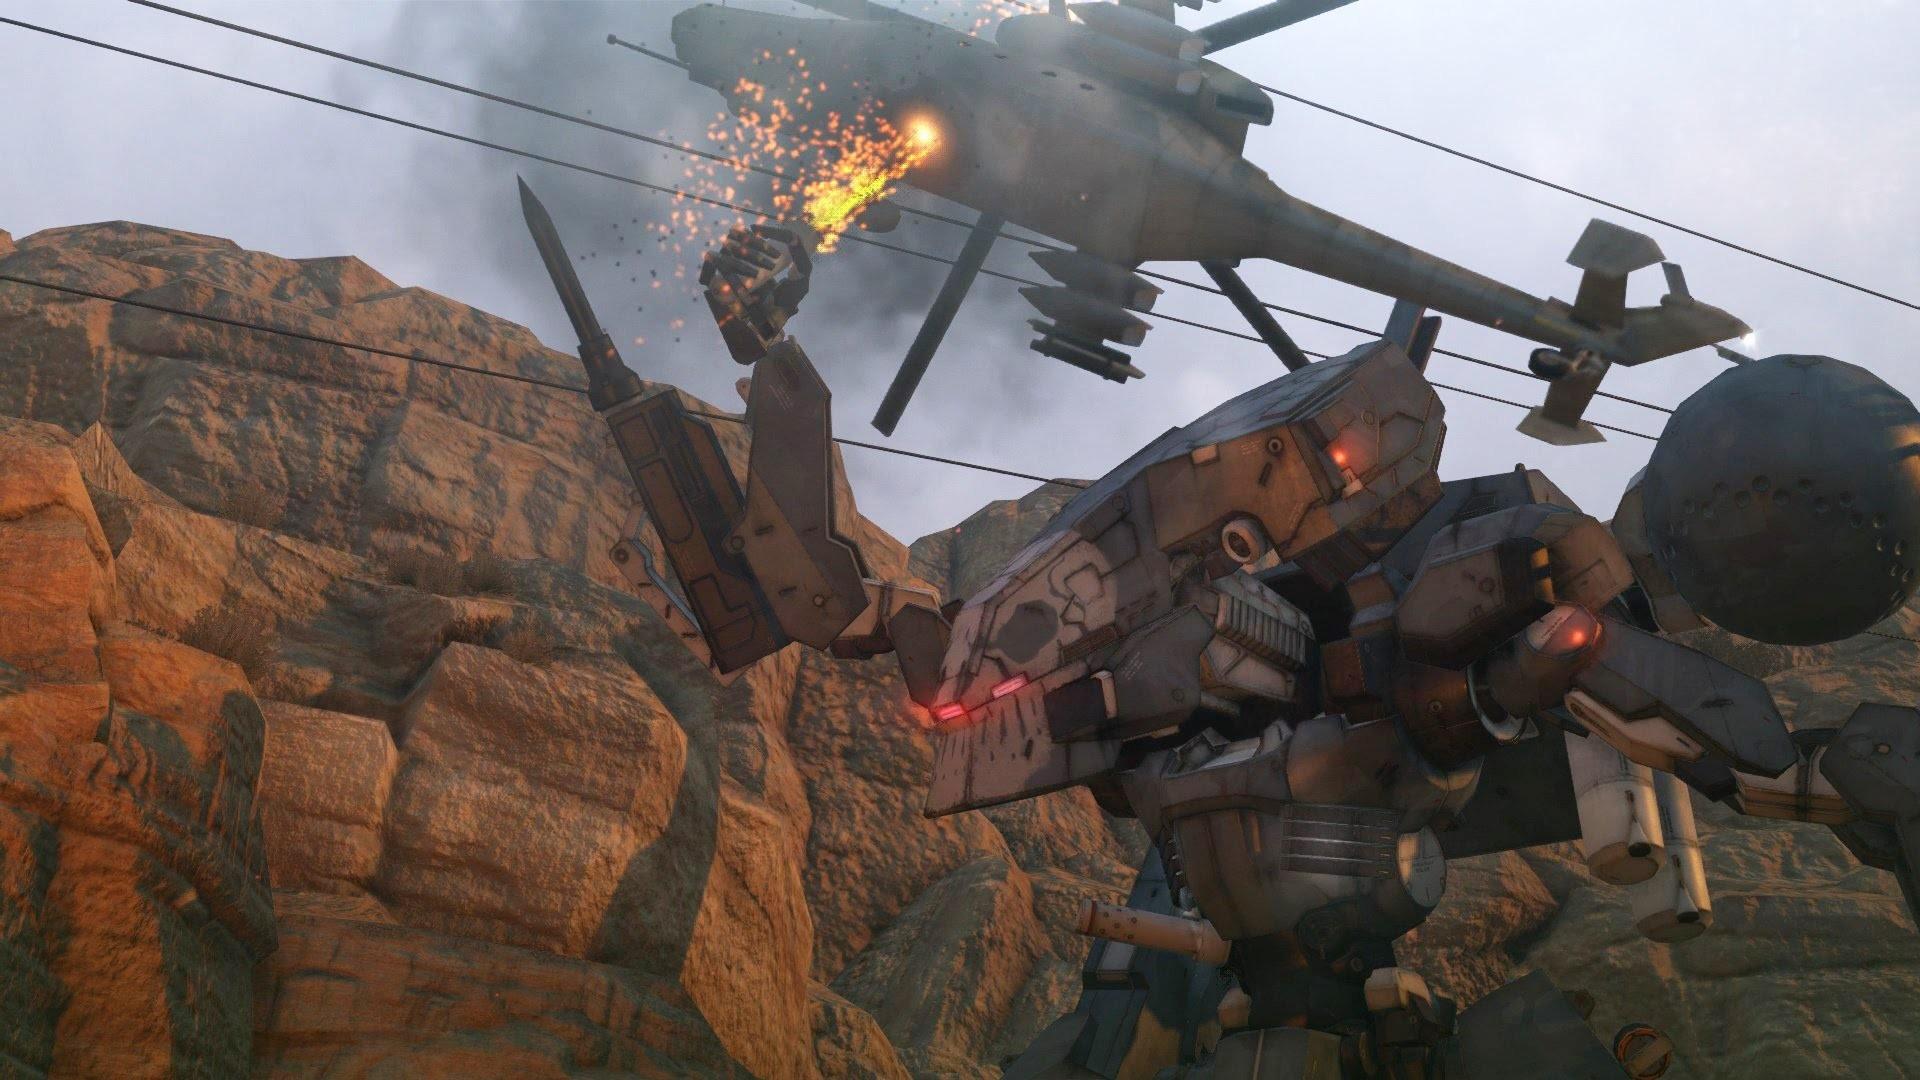 Metal Gear Solid 5: The Phantom Pain – Sahelanthropus Mission Objectives